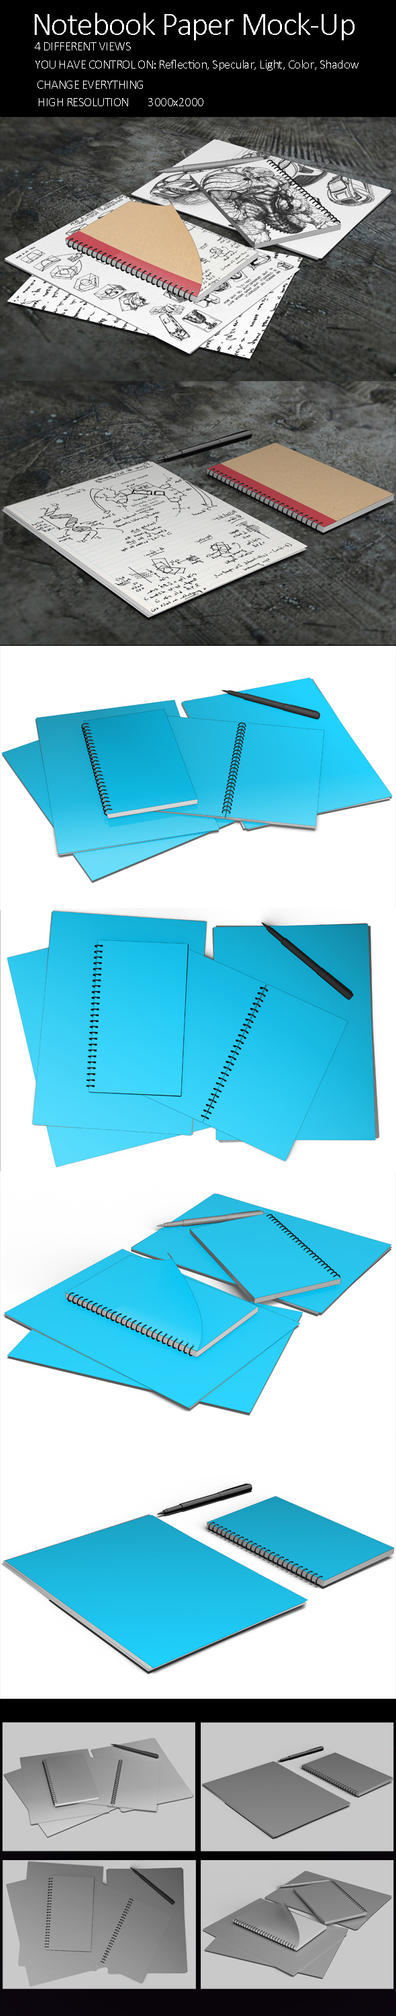 Update Notebook Paper Mock Up by KILVAM